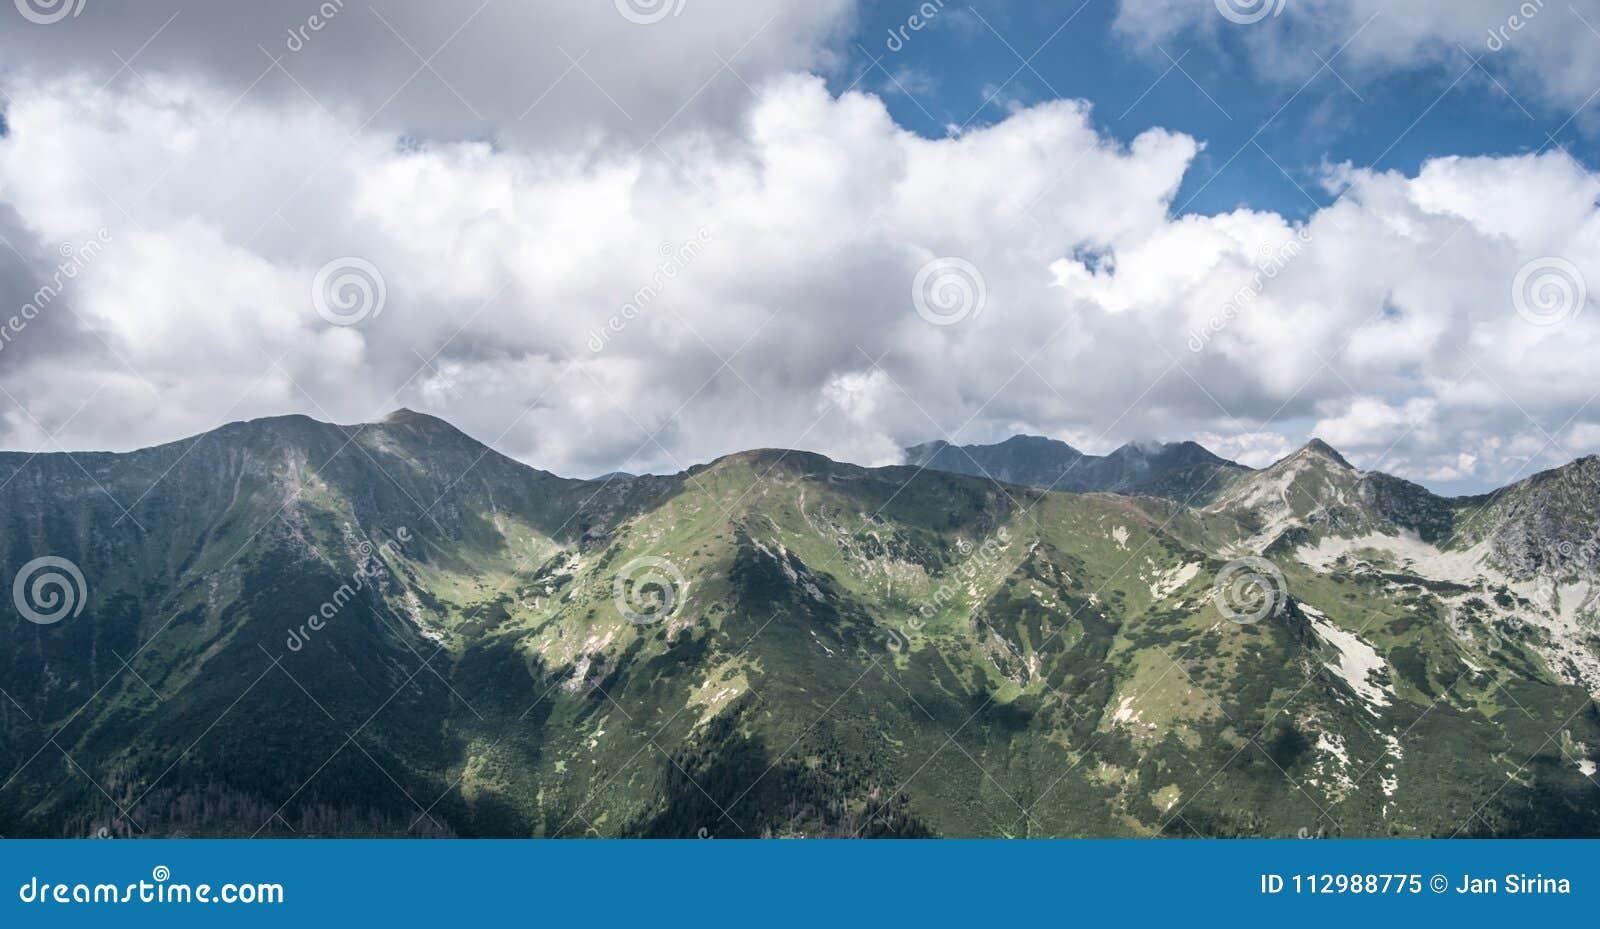 Baranec, Smrek, Placlive, Tri kopy, Hruba kopa and Banikov peaks in Western Tatras mountains in Slovakia